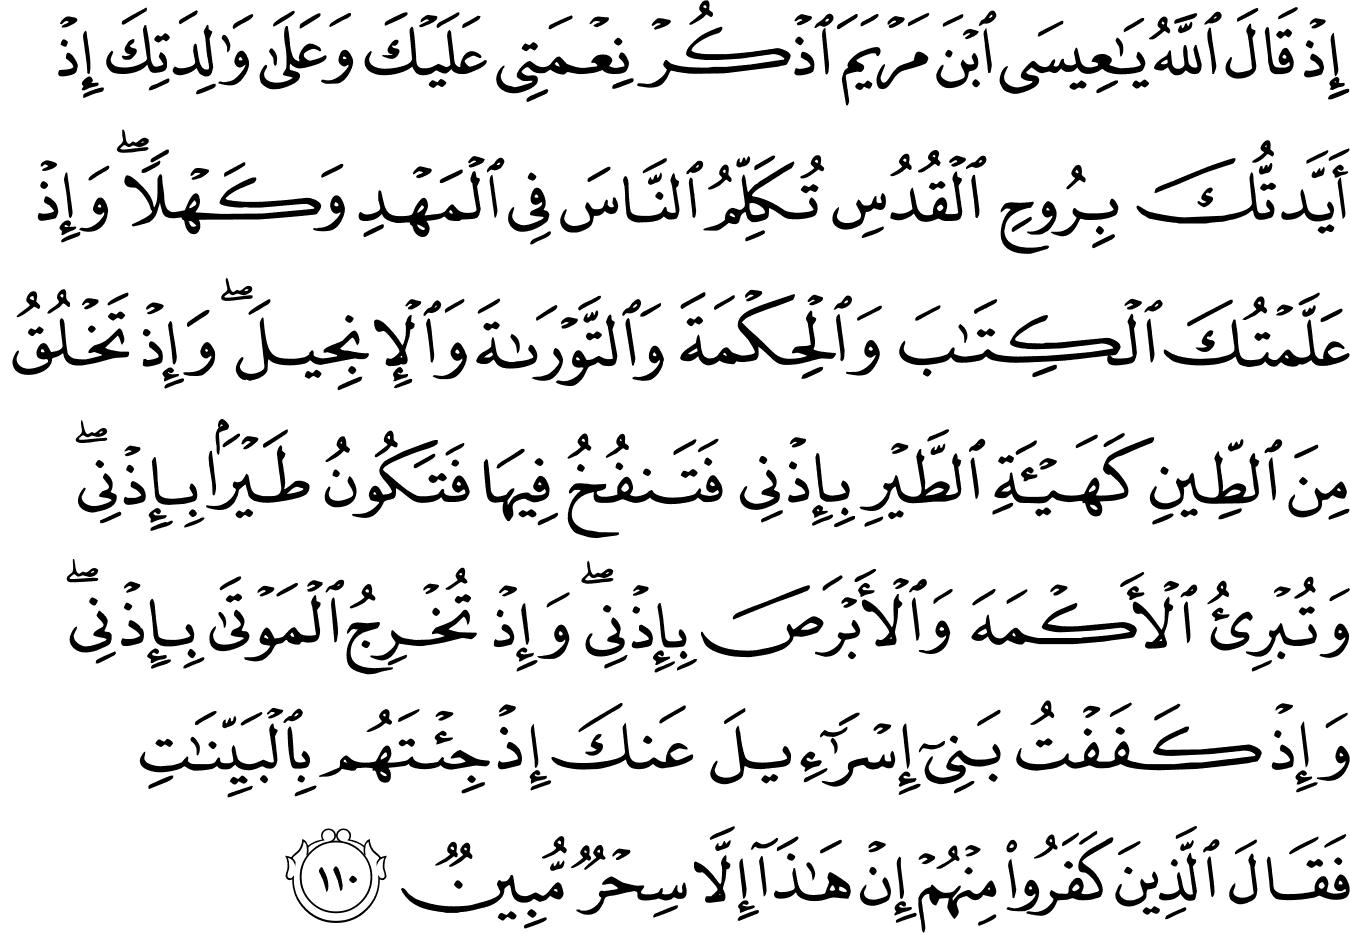 Surat Al Ma Idah 5 110 120 The Noble Qur An القرآن الكريم